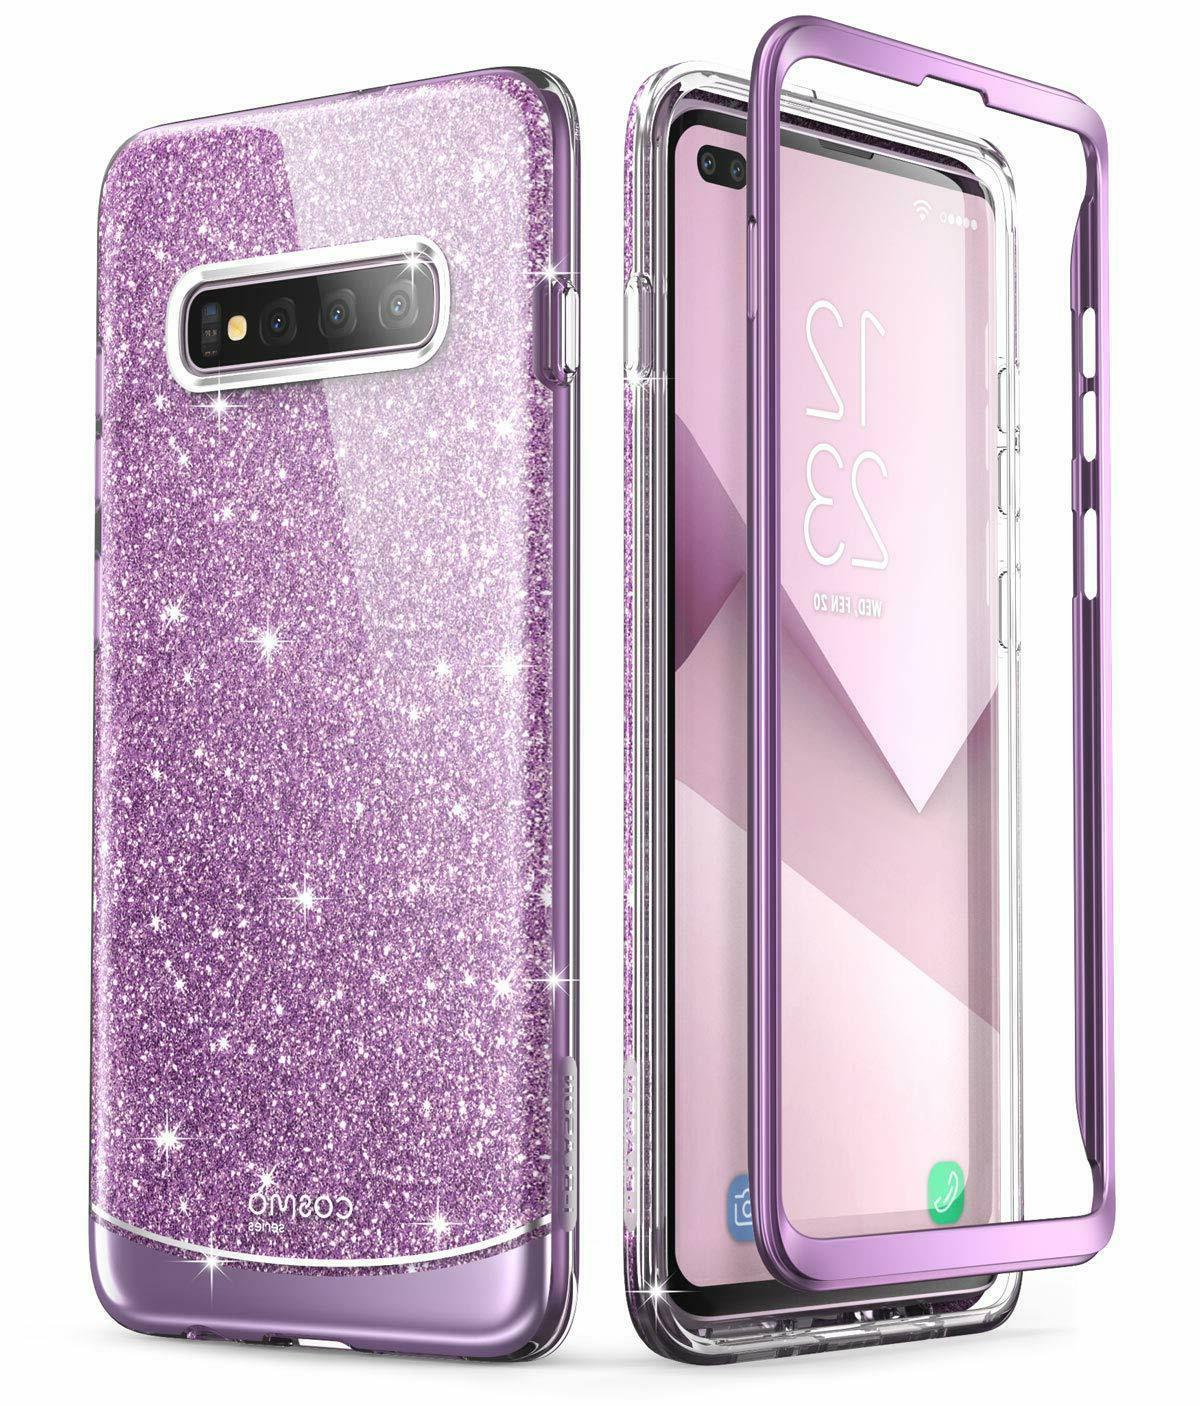 Samsung Galaxy S10 Case, Cosmo Protective Cover